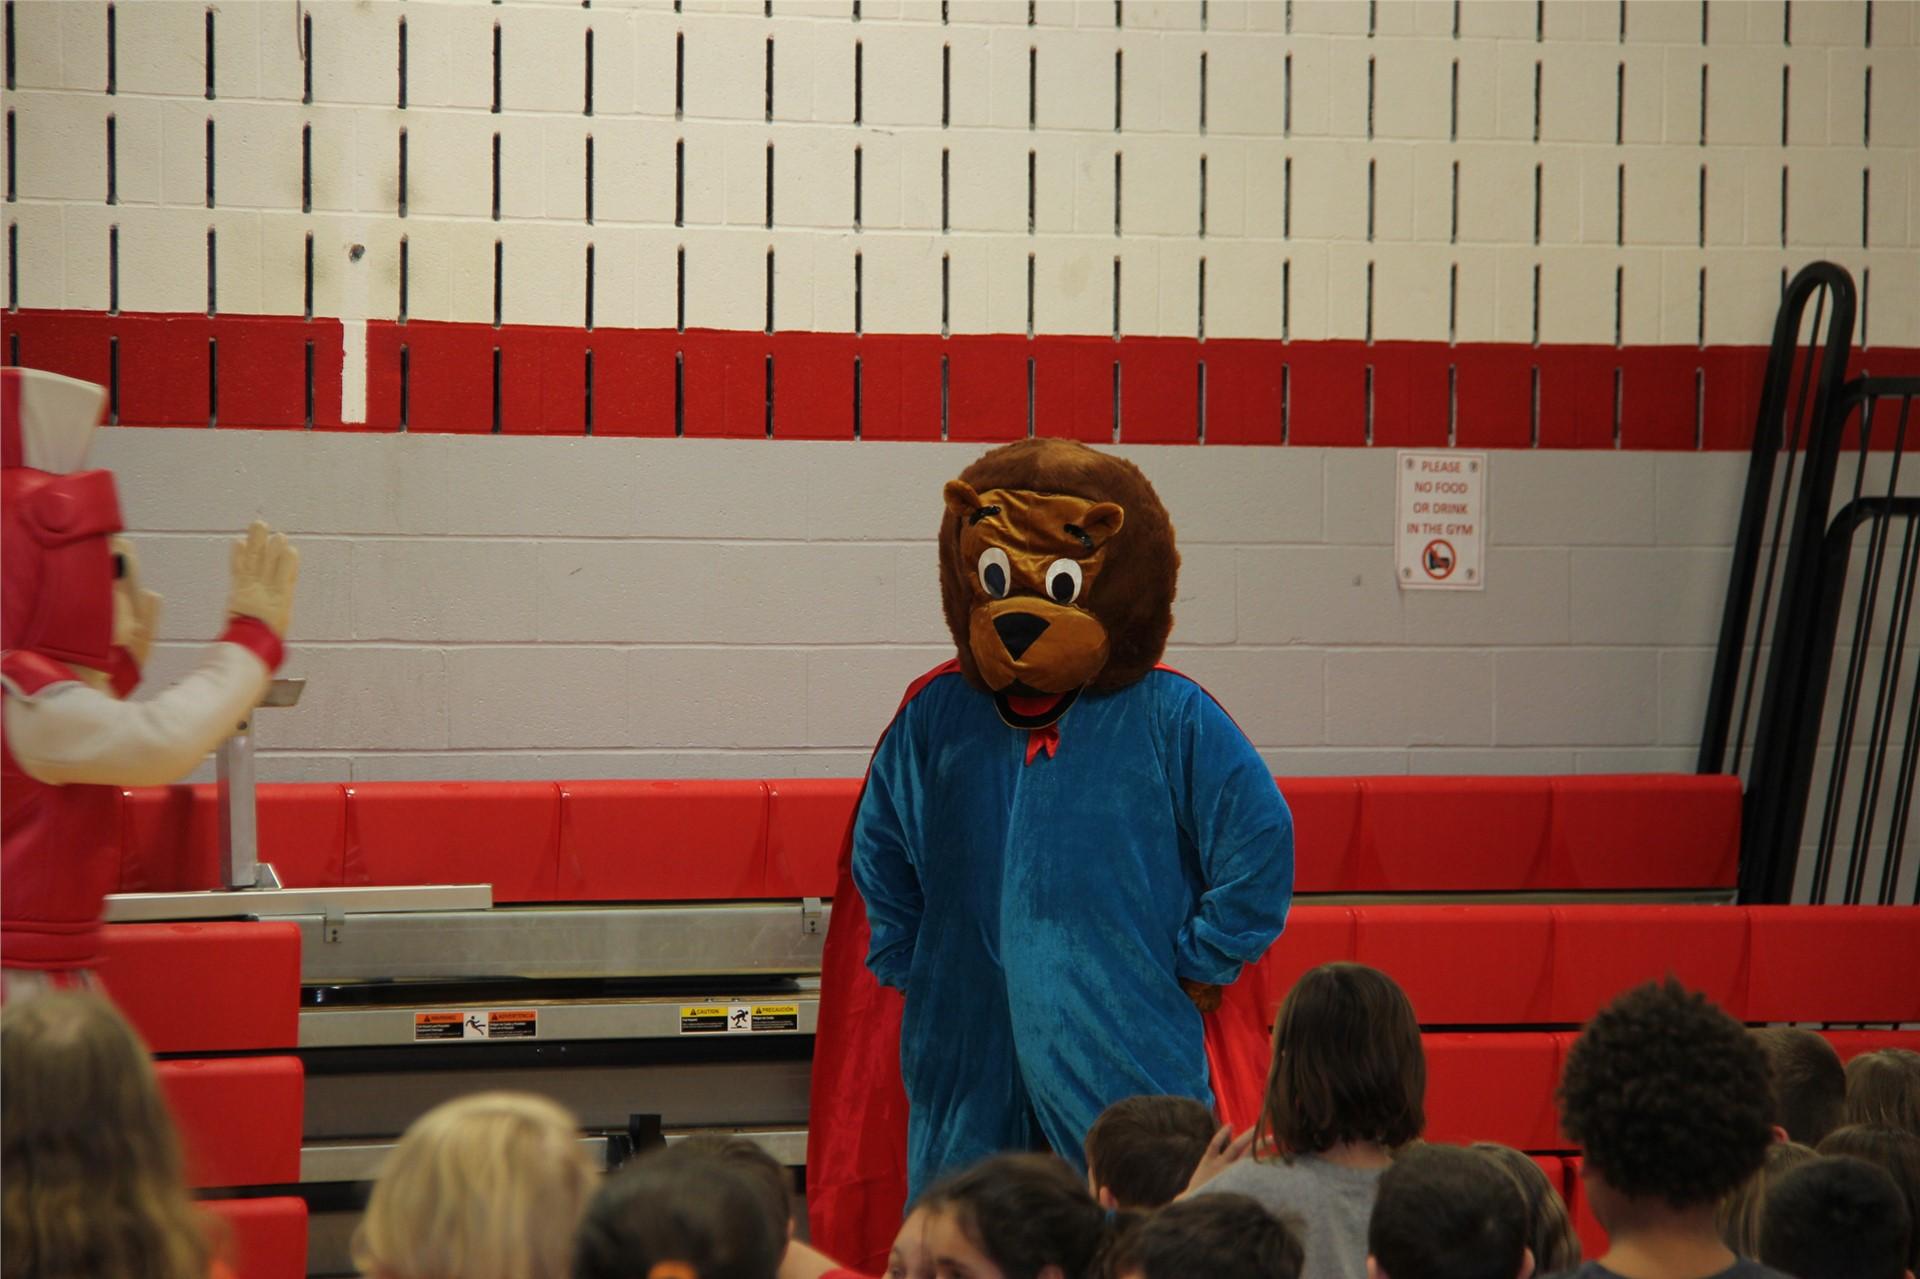 closer shot of bear mascot